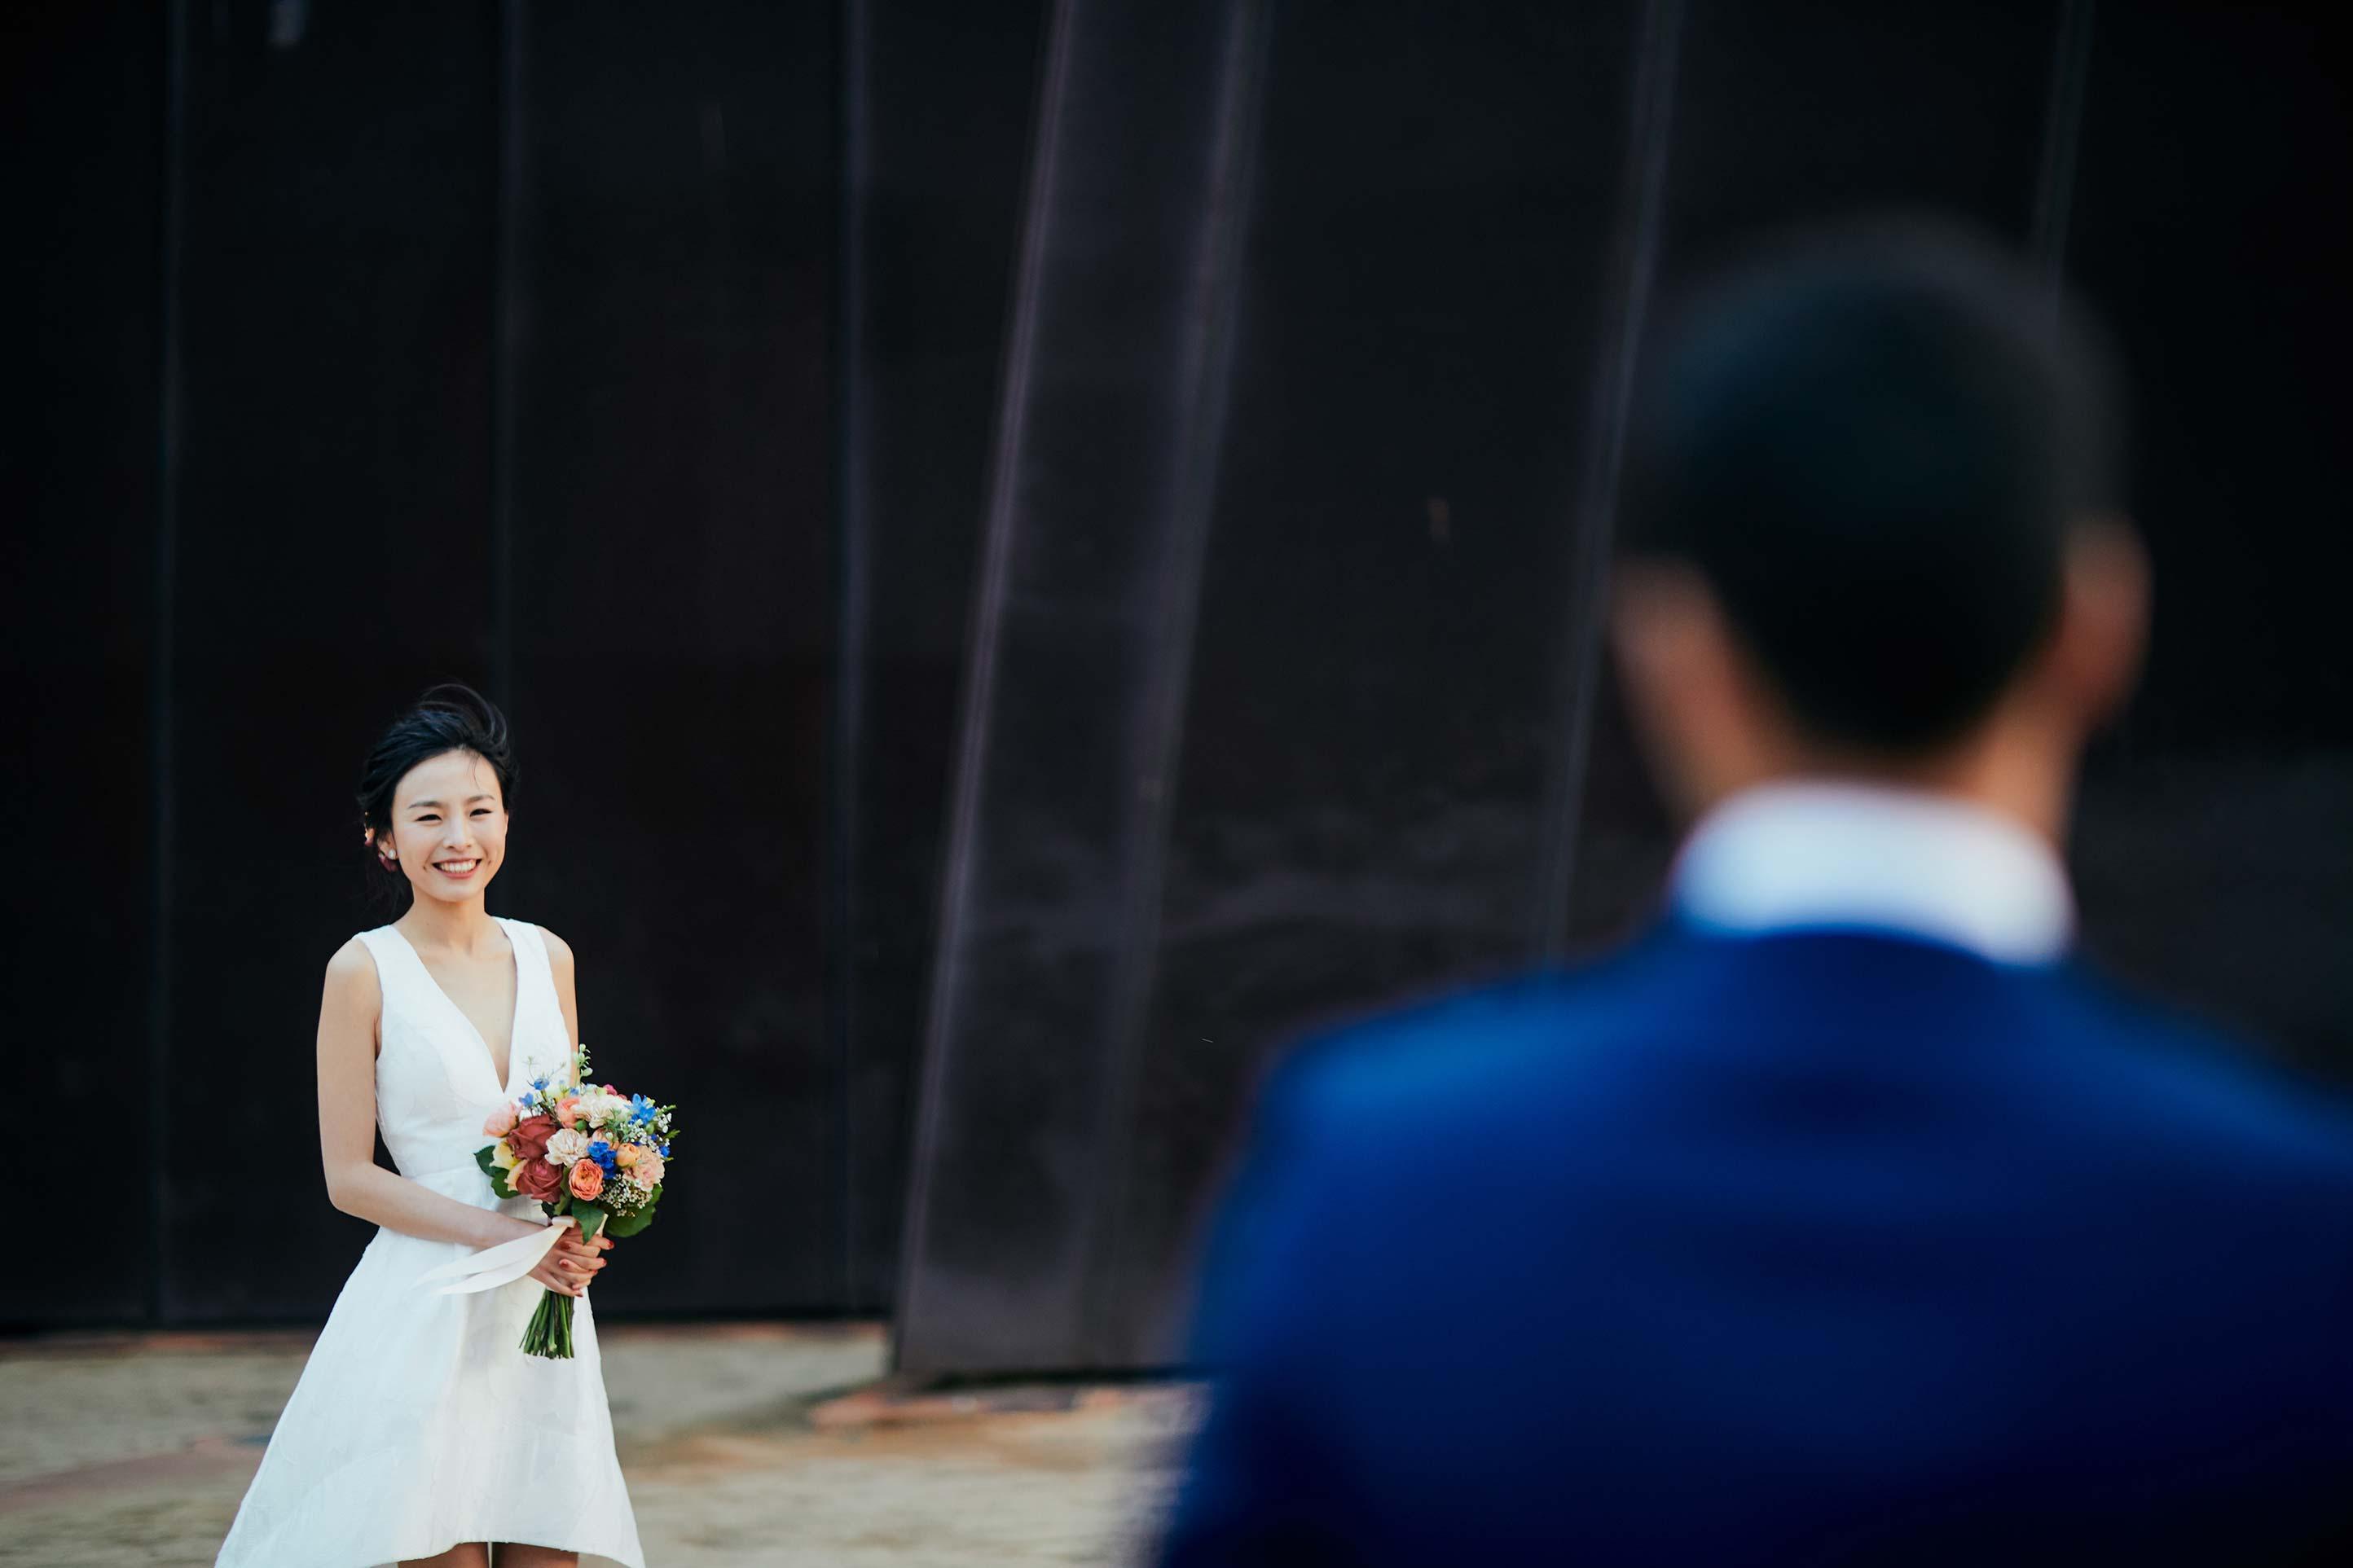 Melbourne-Wedding-Photographer-Kettle-Black-ACCA-bride